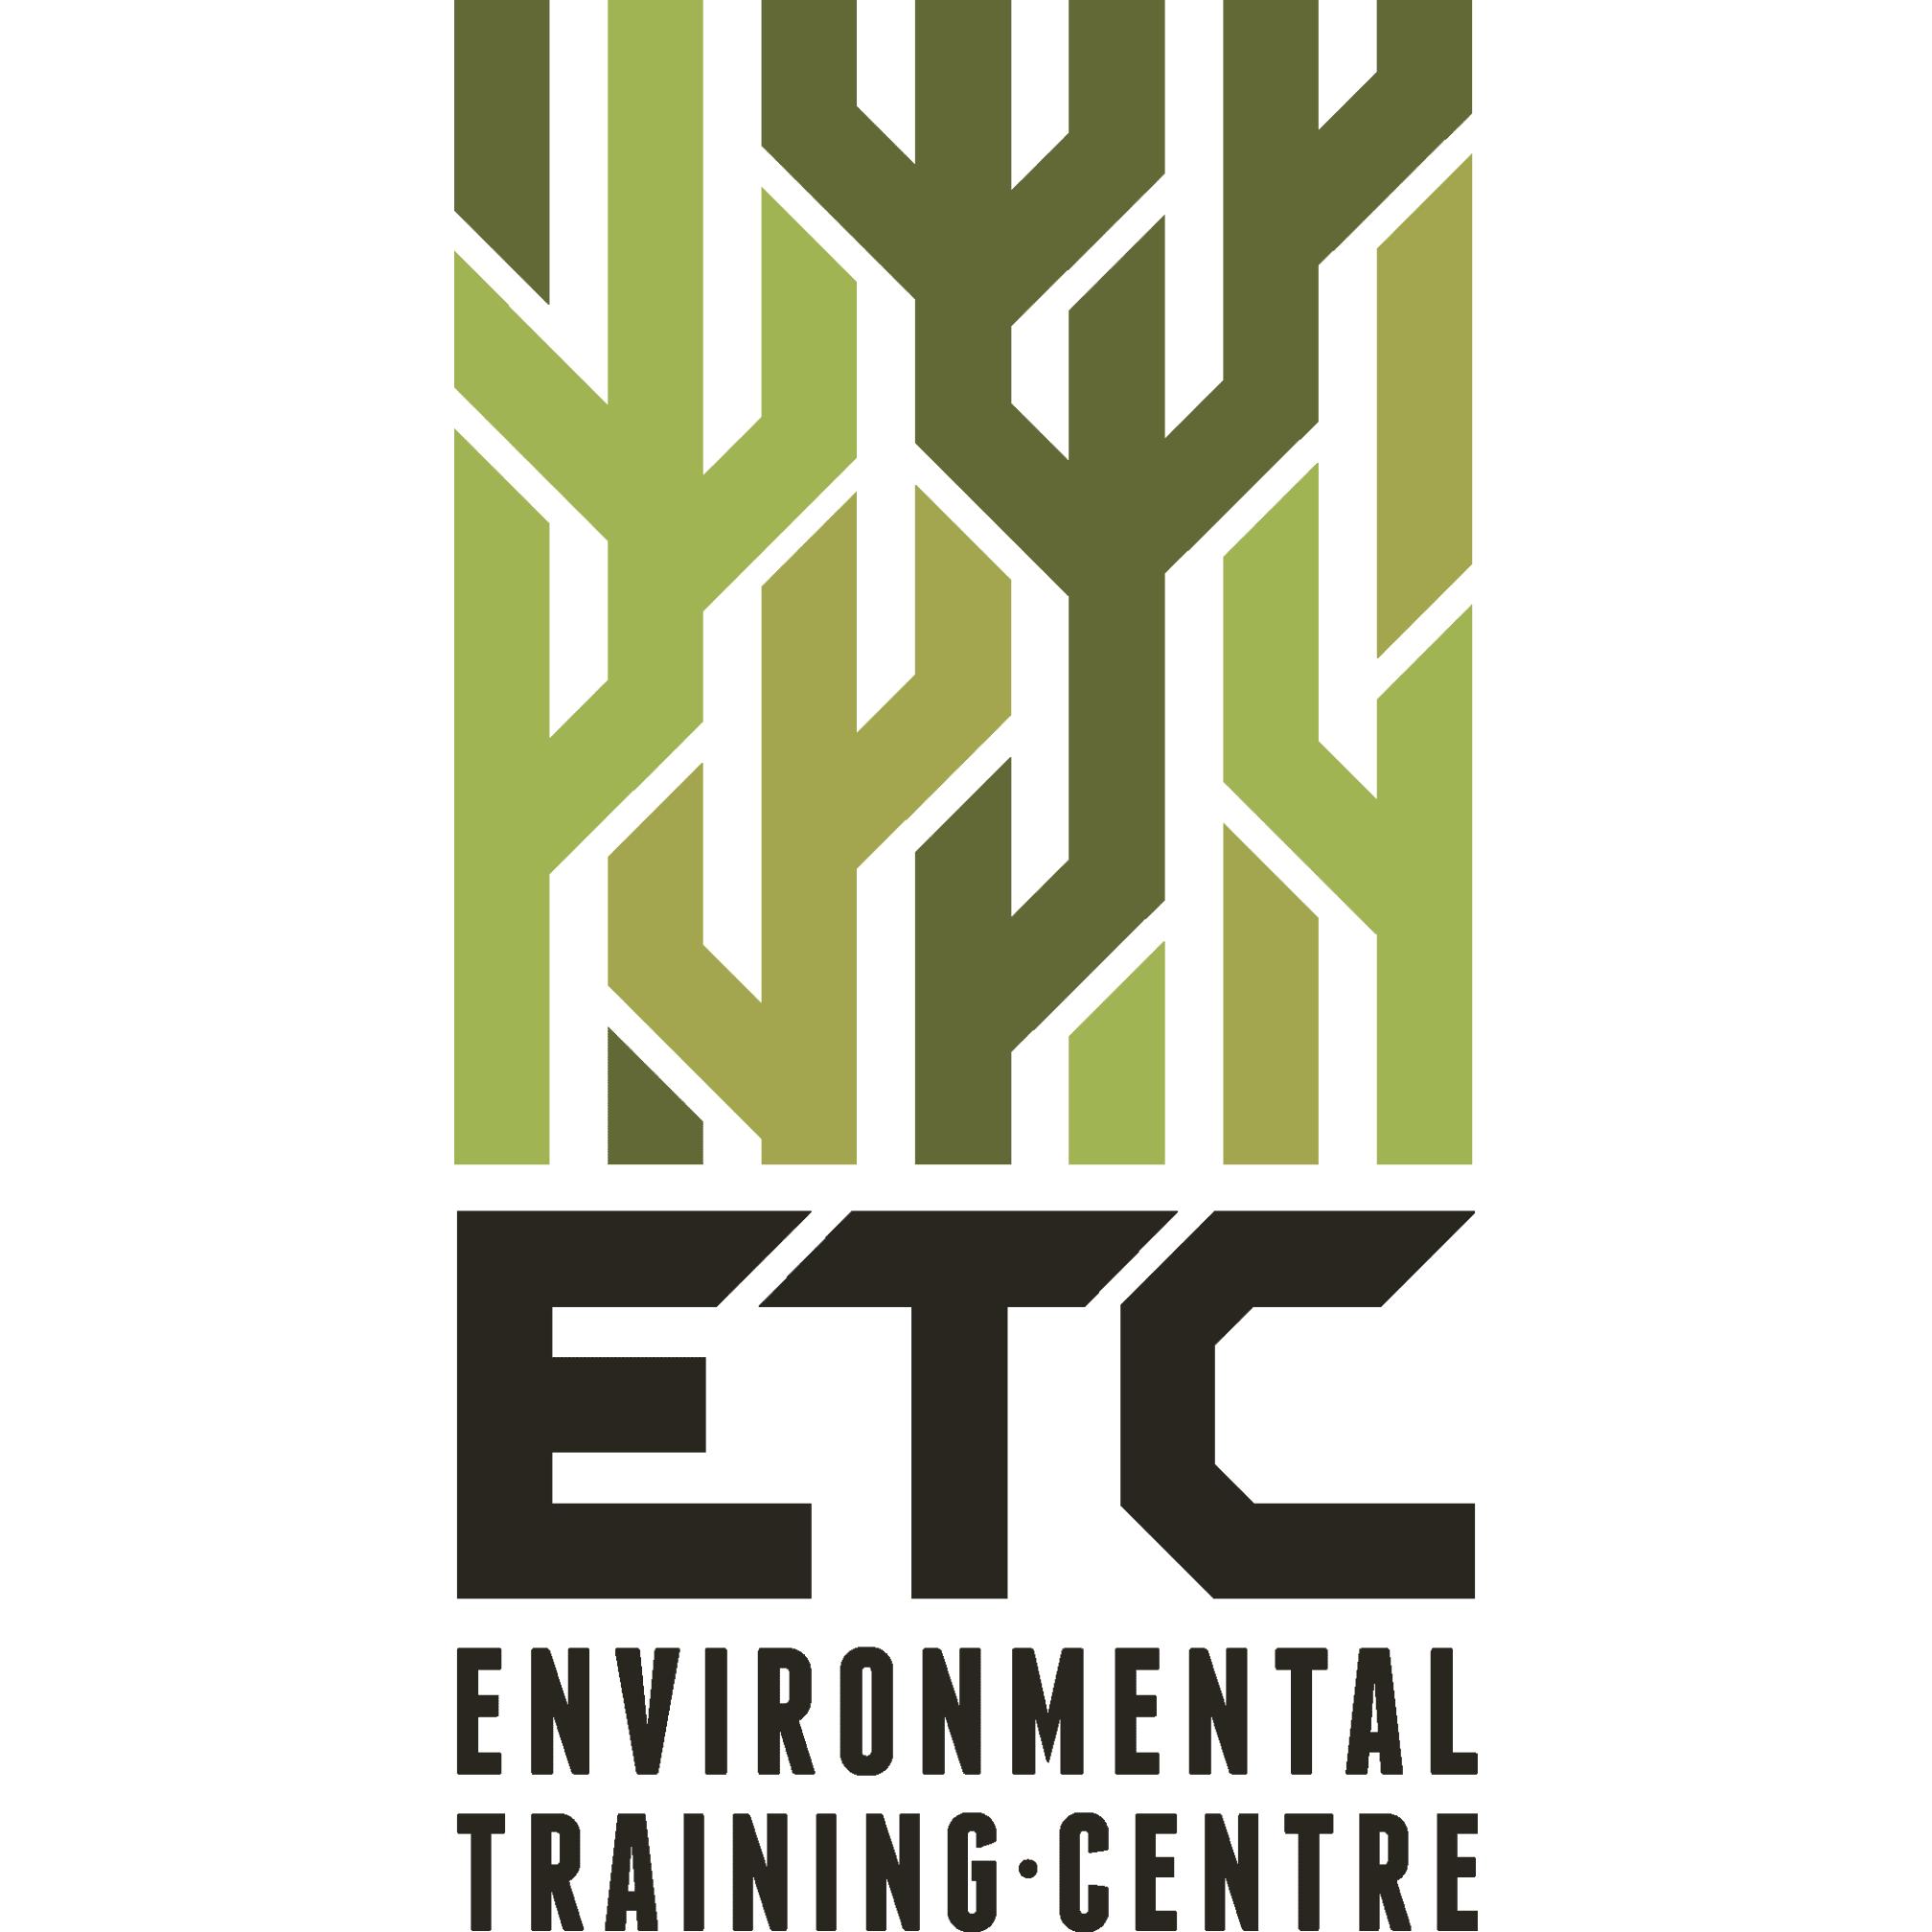 Environmental Training Centre Ltd - Stafford, Staffordshire ST20 0NZ - 01785 334312 | ShowMeLocal.com